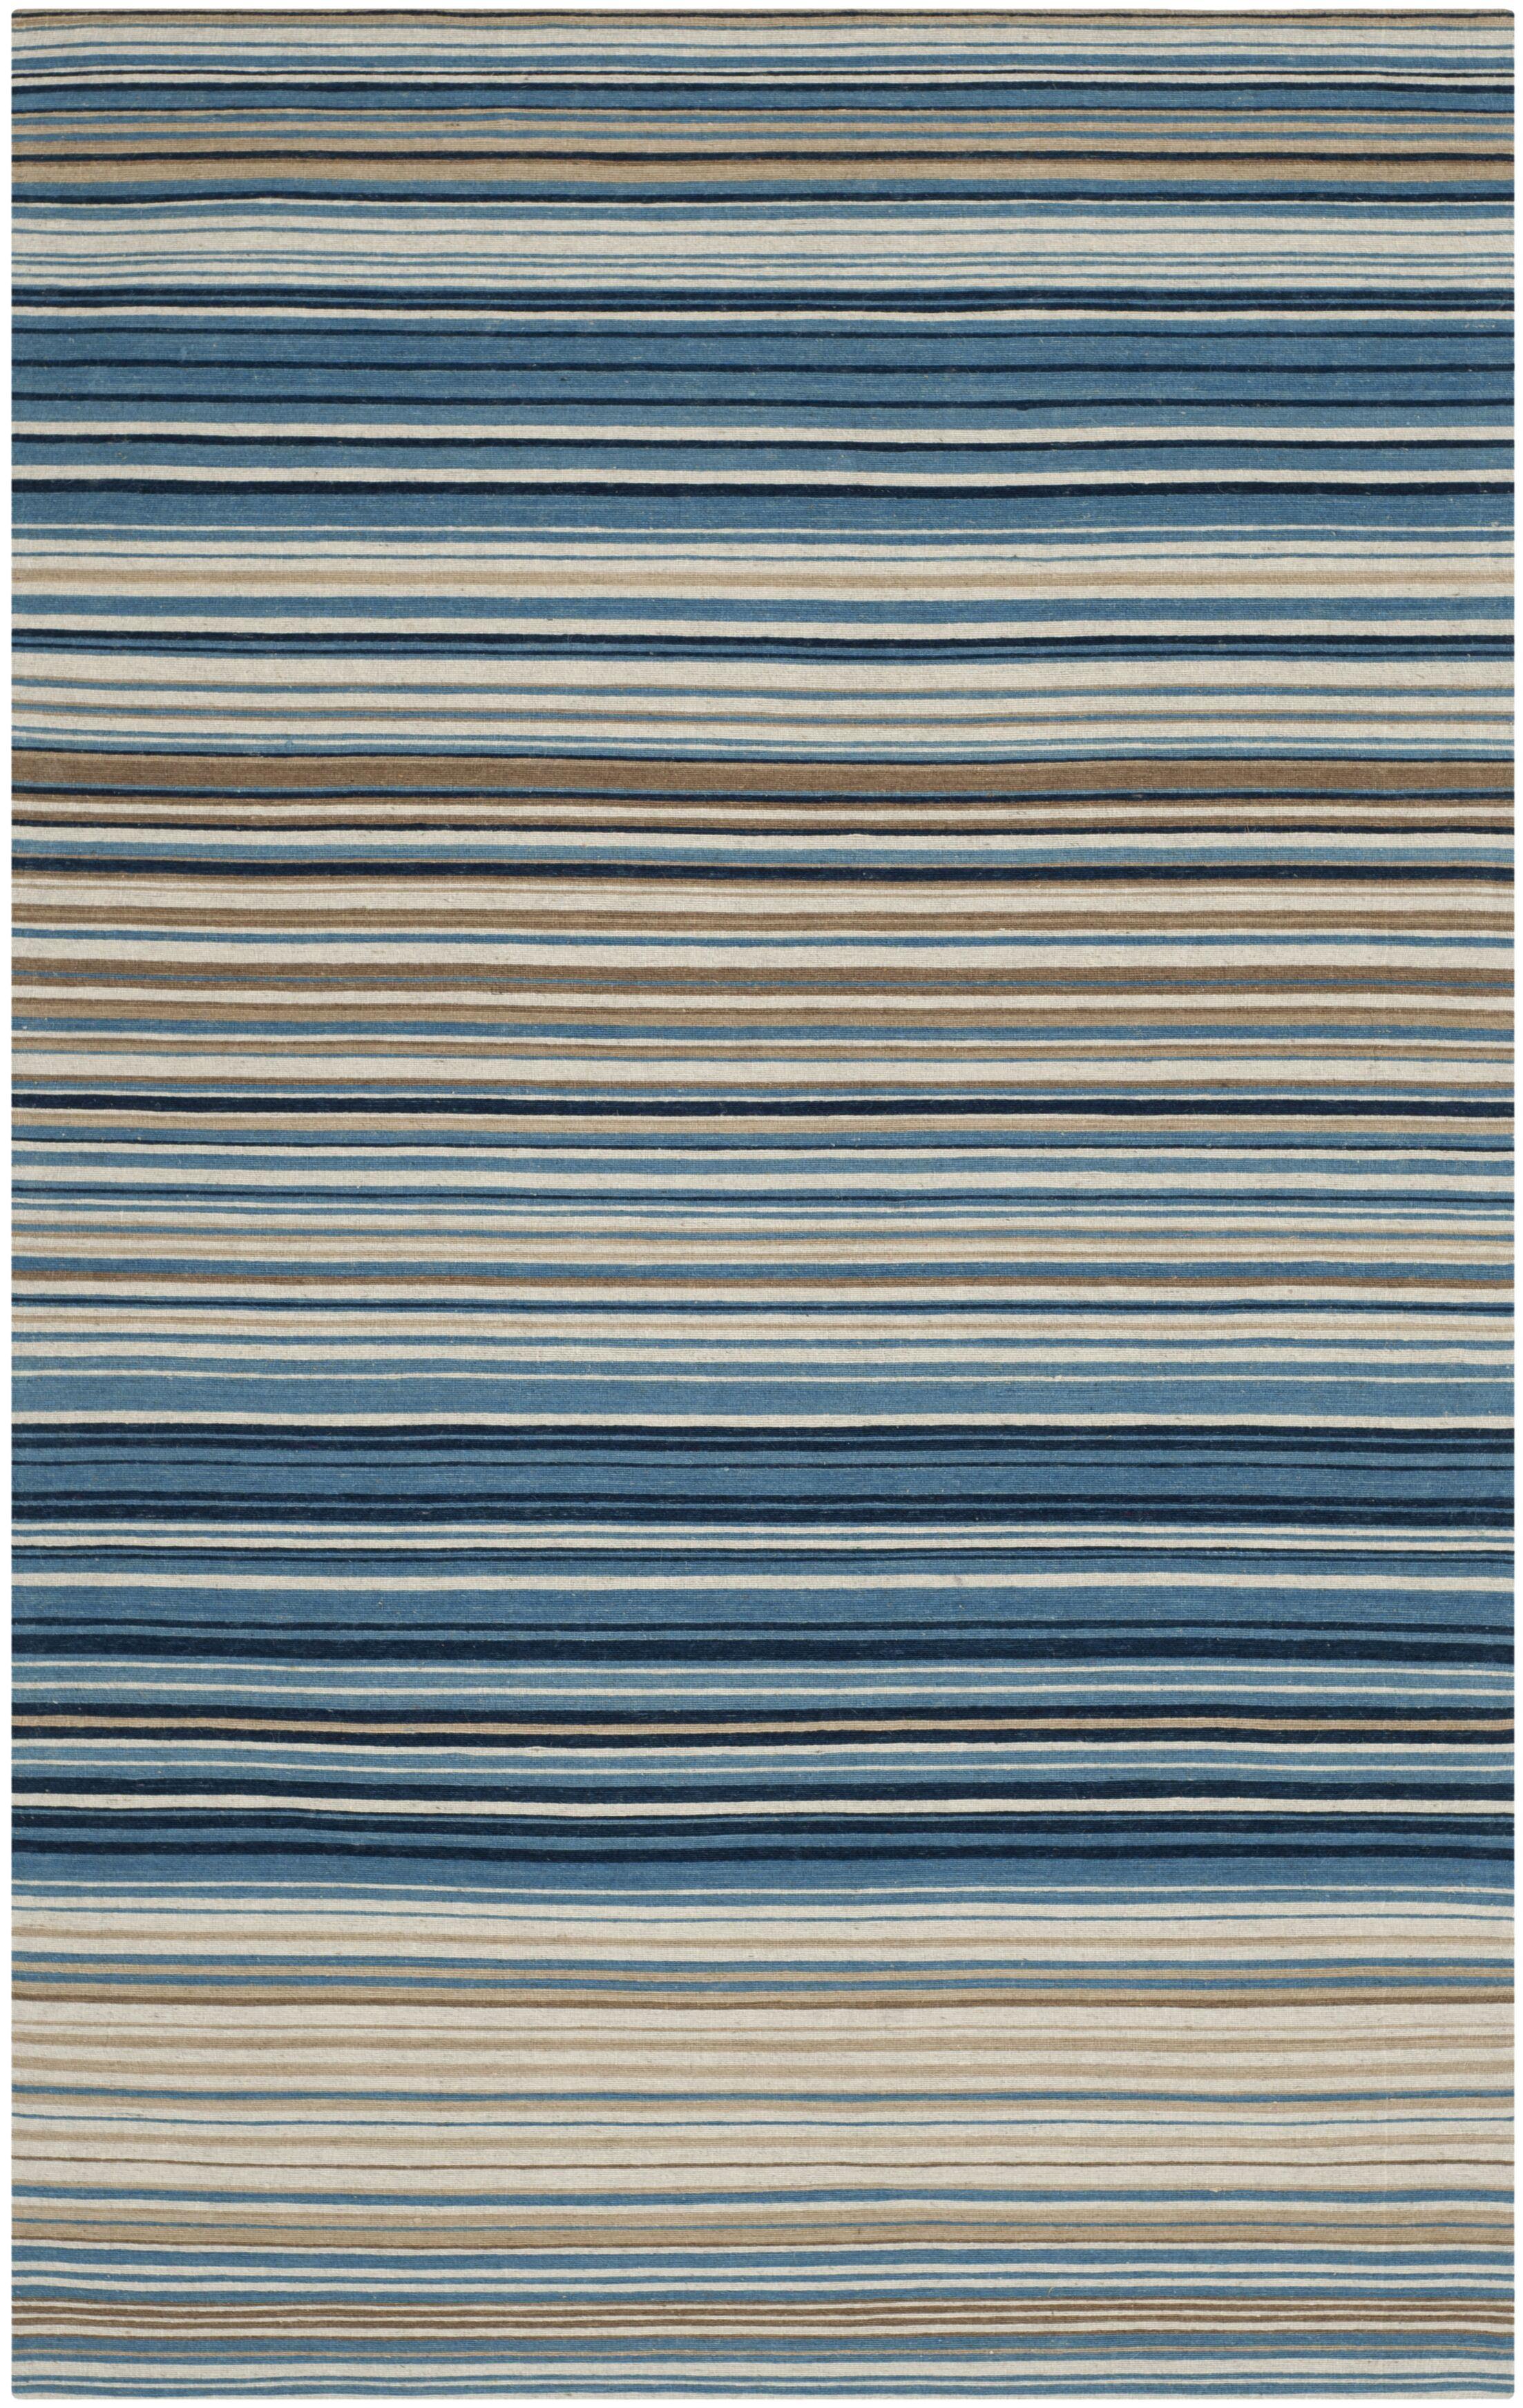 Jefferson Striped Contemporary Area Rug Rug Size: Rectangle 5' x 8'